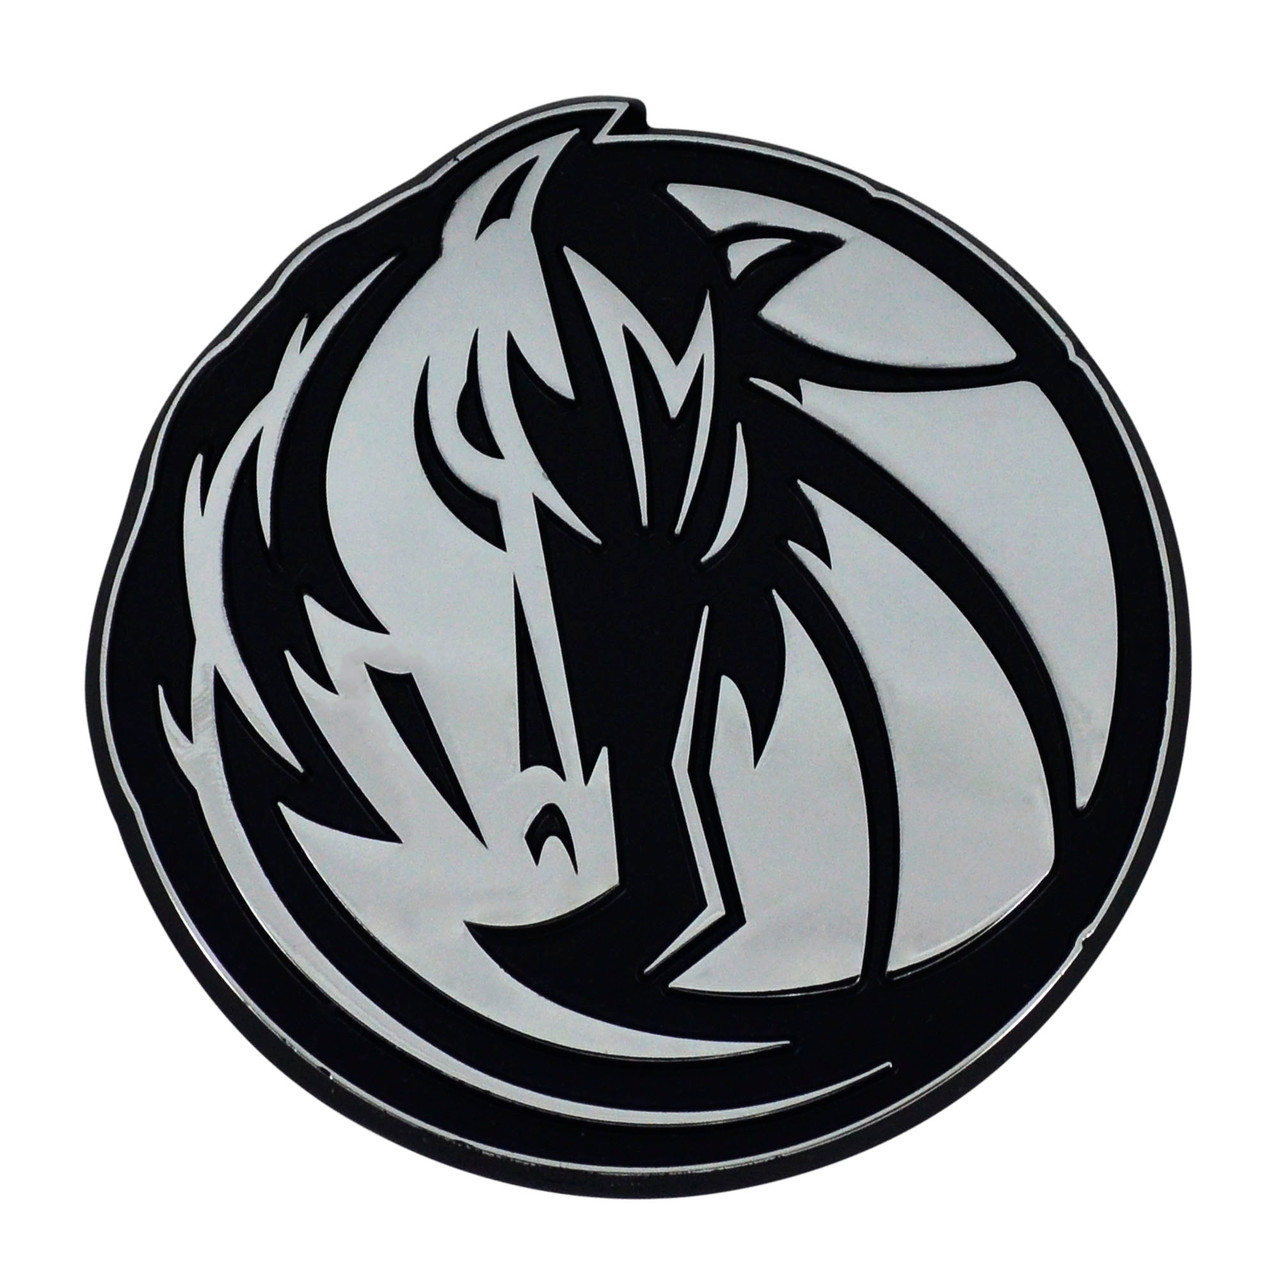 Dallas Mavericks Auto Emblem Premium Metal Chrome Special Order